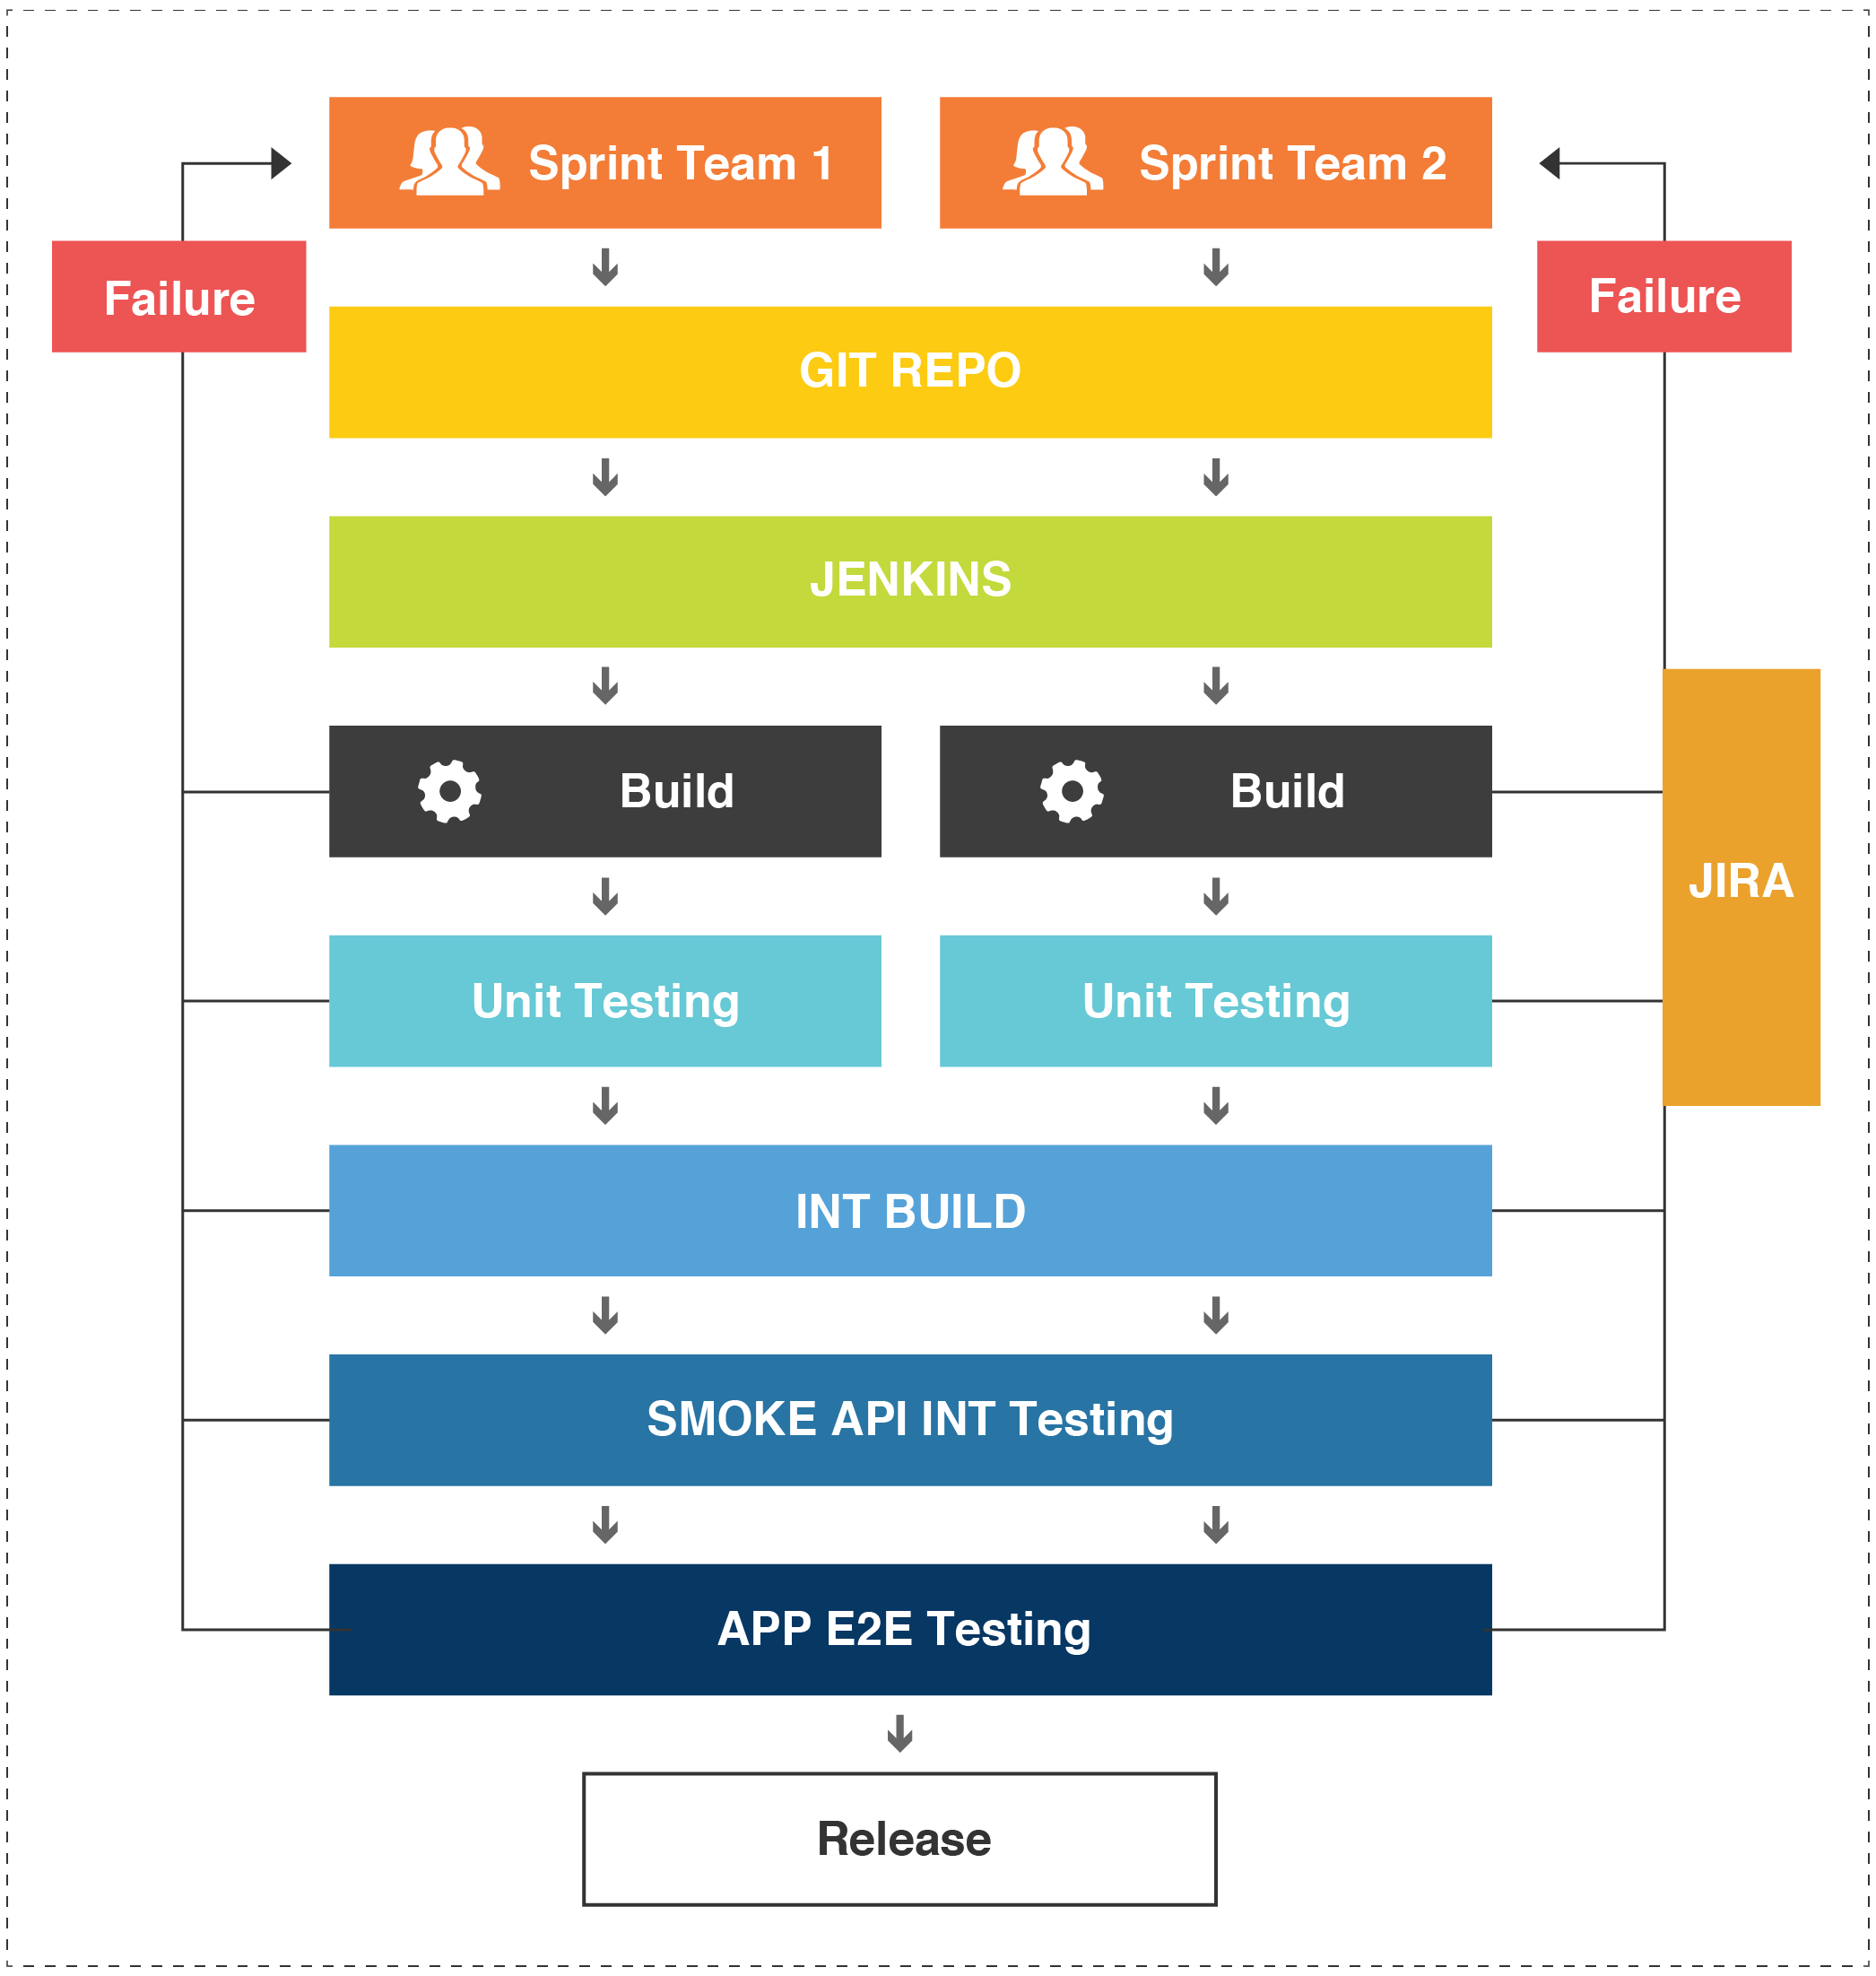 Continuous Integration flow: sprint teams, git repo, jenkins, build, unit testing, int build, smoke API int testing, app e2e testing, release